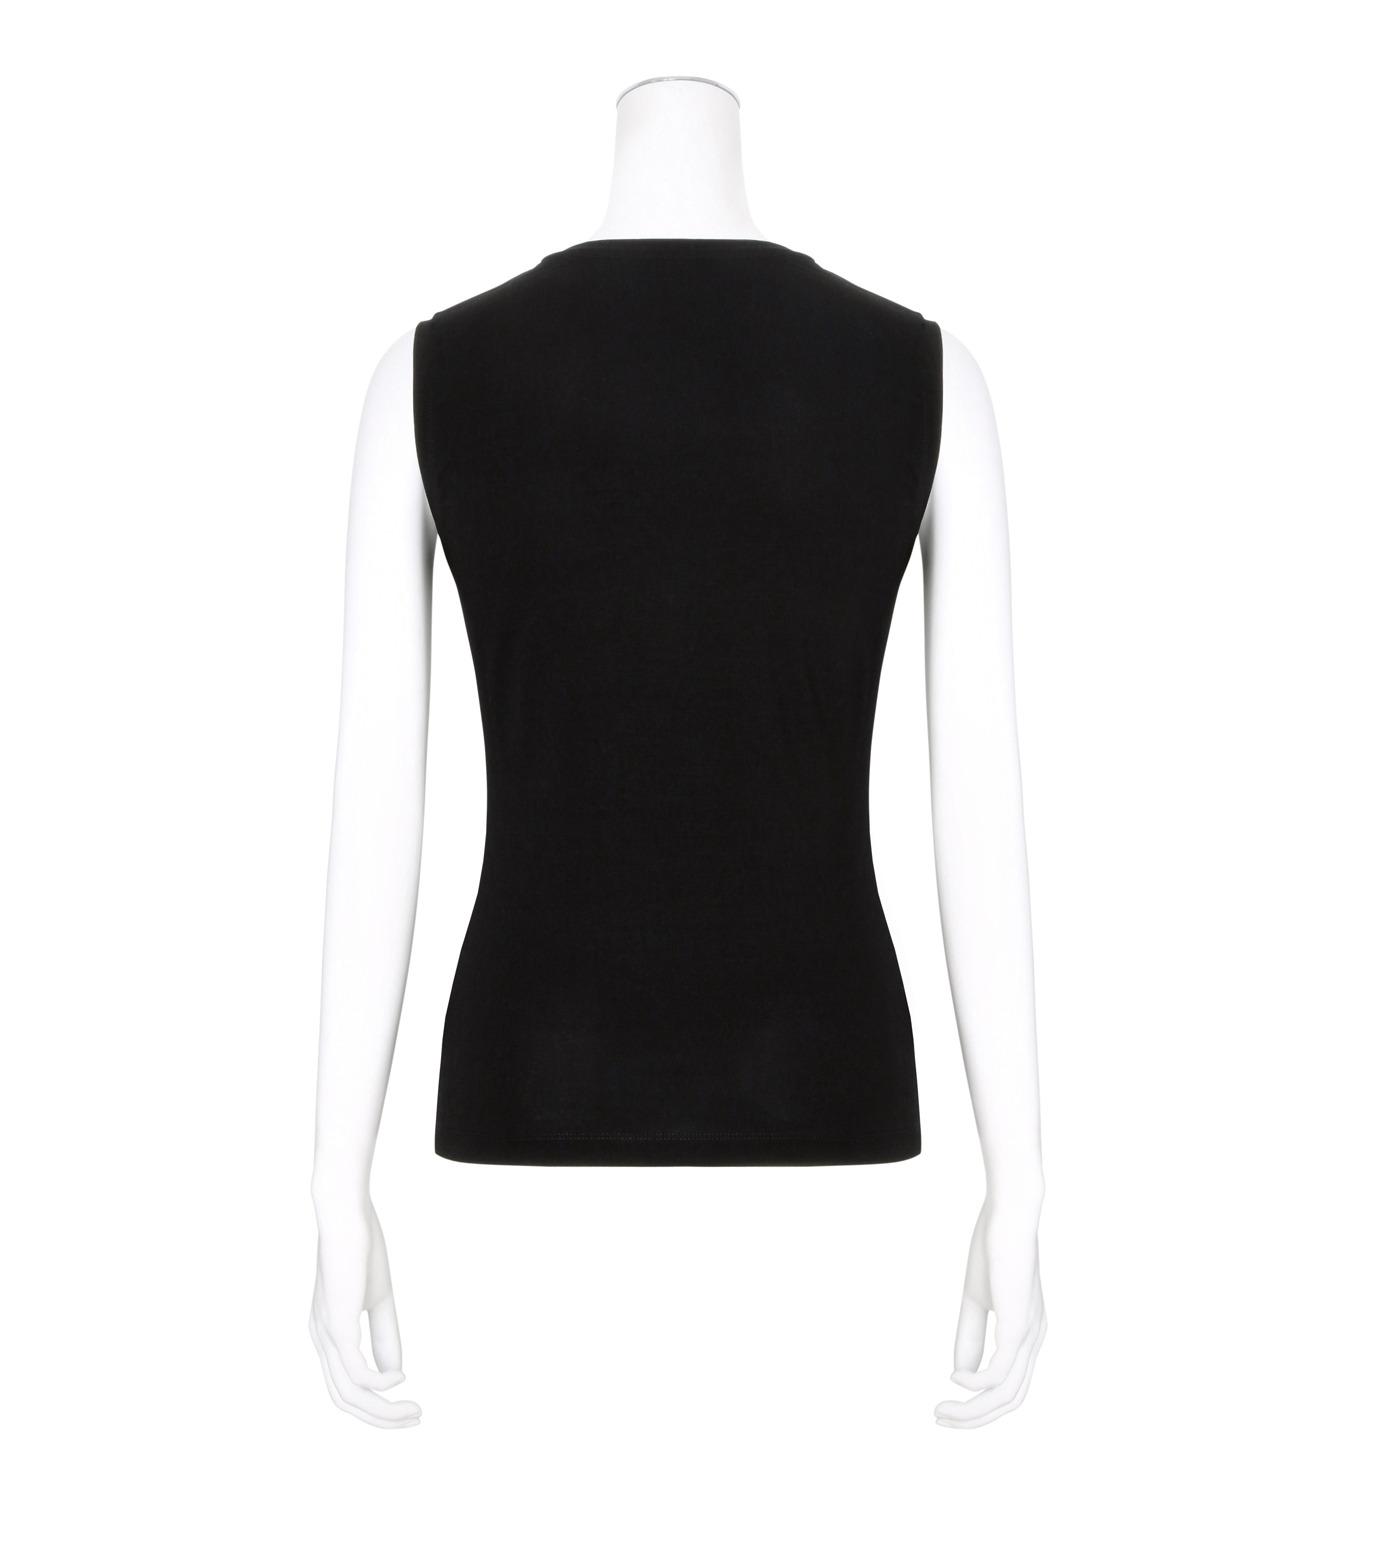 ACNE STUDIOS(アクネ ストゥディオズ)のTank Top-BLACK(カットソー/cut and sewn)-15A166-13 拡大詳細画像2